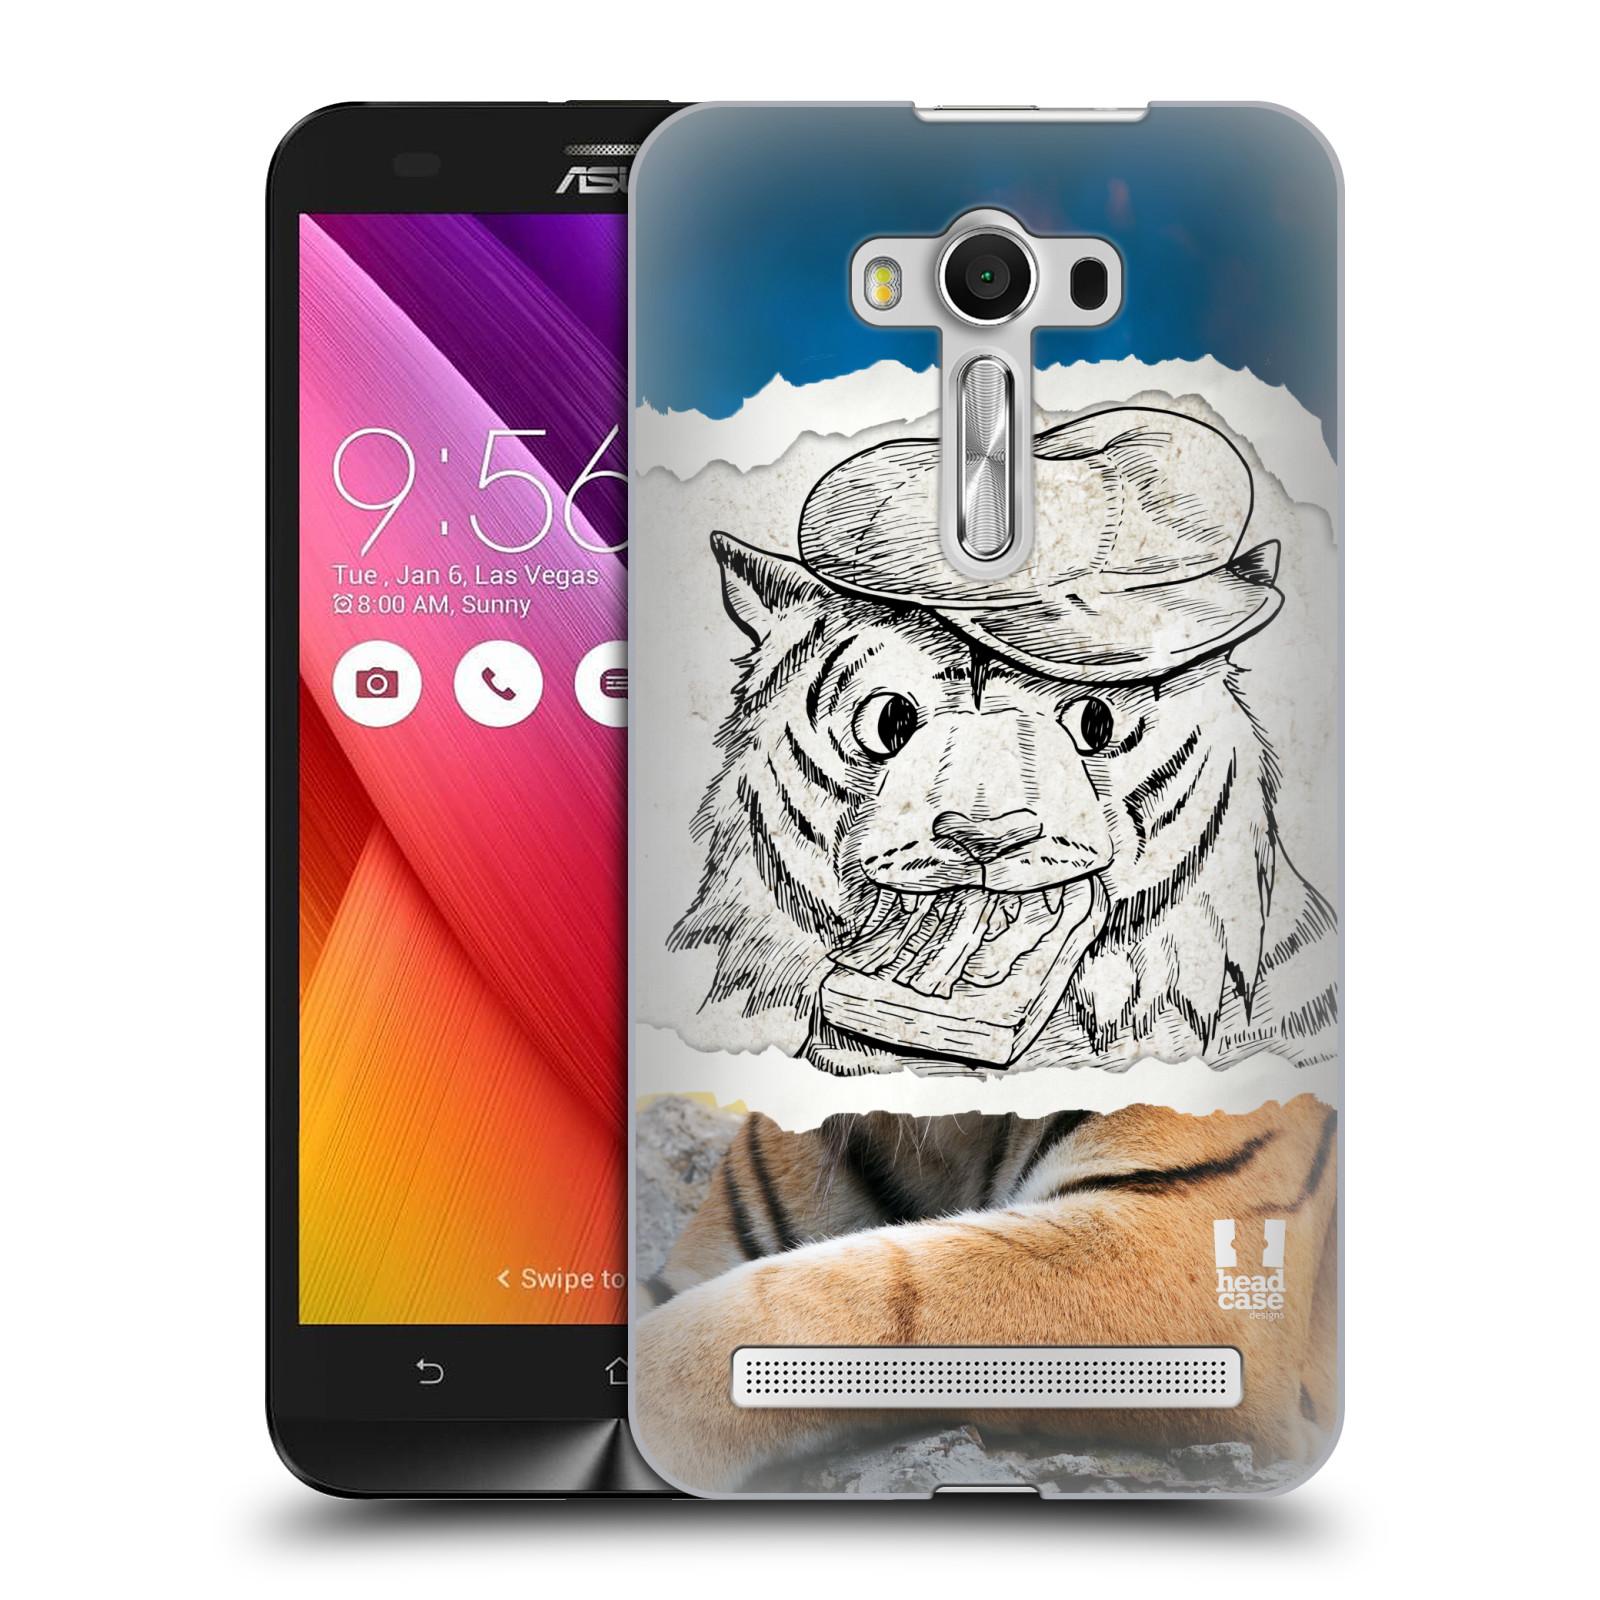 HEAD CASE plastový obal na mobil Asus Zenfone 2 LASER (5,5 displej ZE550KL) vzor zvířata koláž tygr fešák